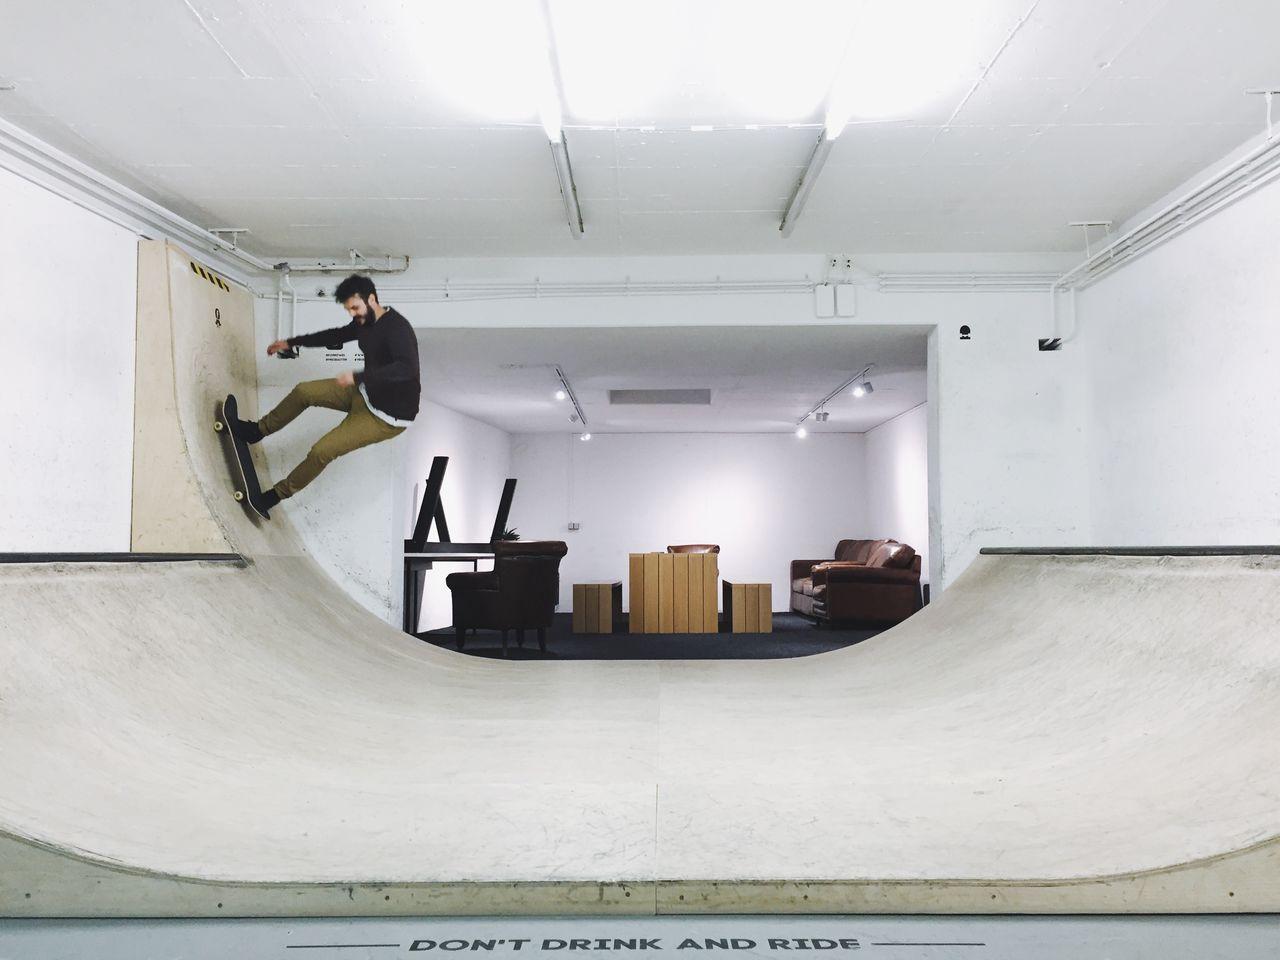 Skate Skateboard Skateboarding Sport Fun Working Work Friends Friendship Vscocam EyeEm Best Shots Eye4photography